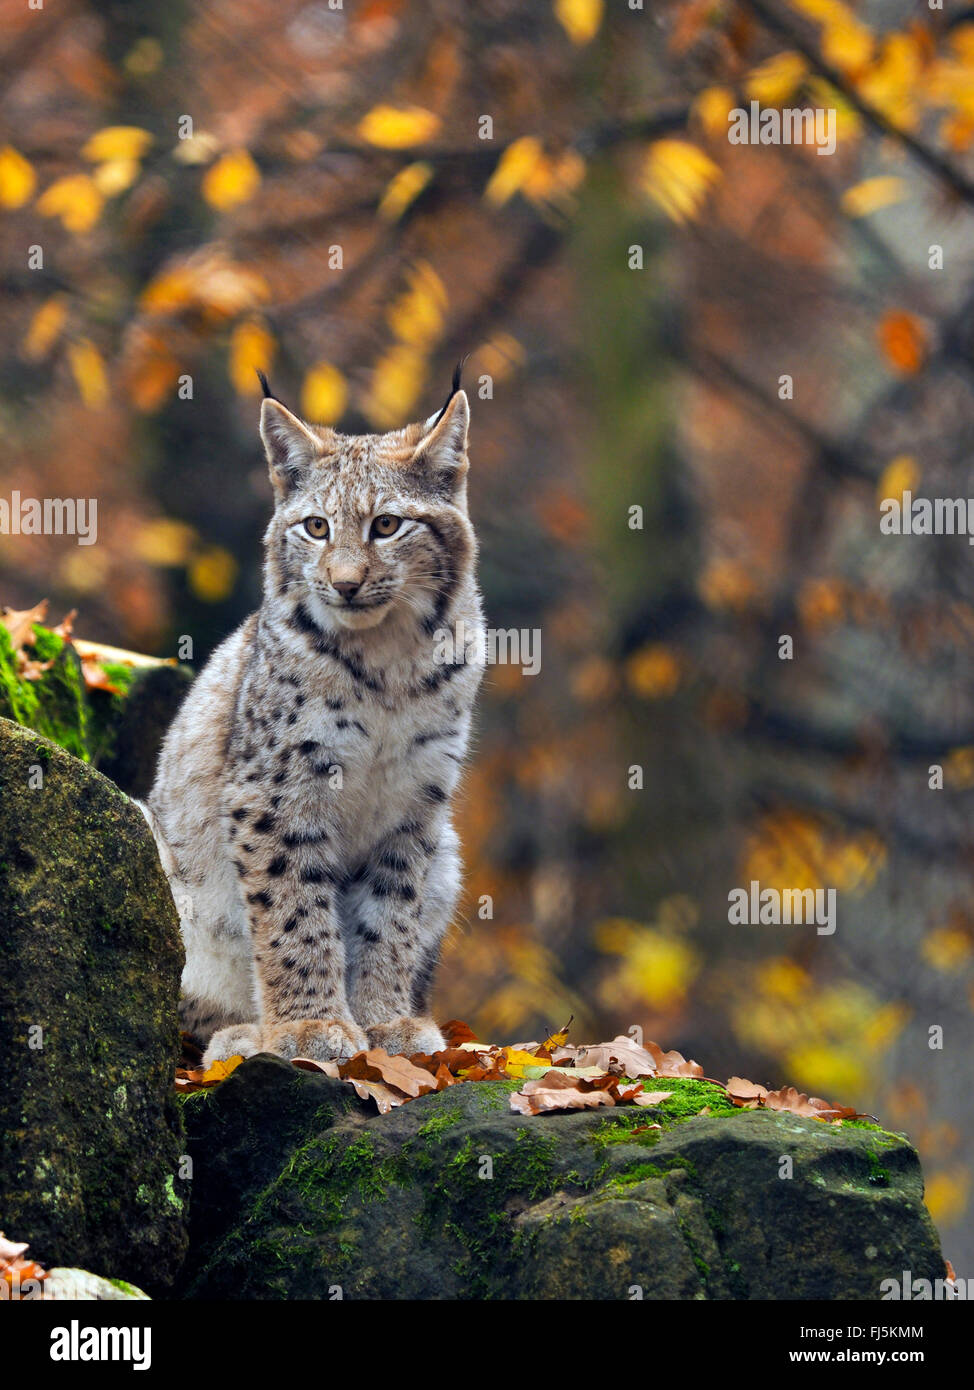 Nord (Lynx Lynx Lynx lynx), giovane lynx seduto su un masso, in Germania, in Baviera Immagini Stock